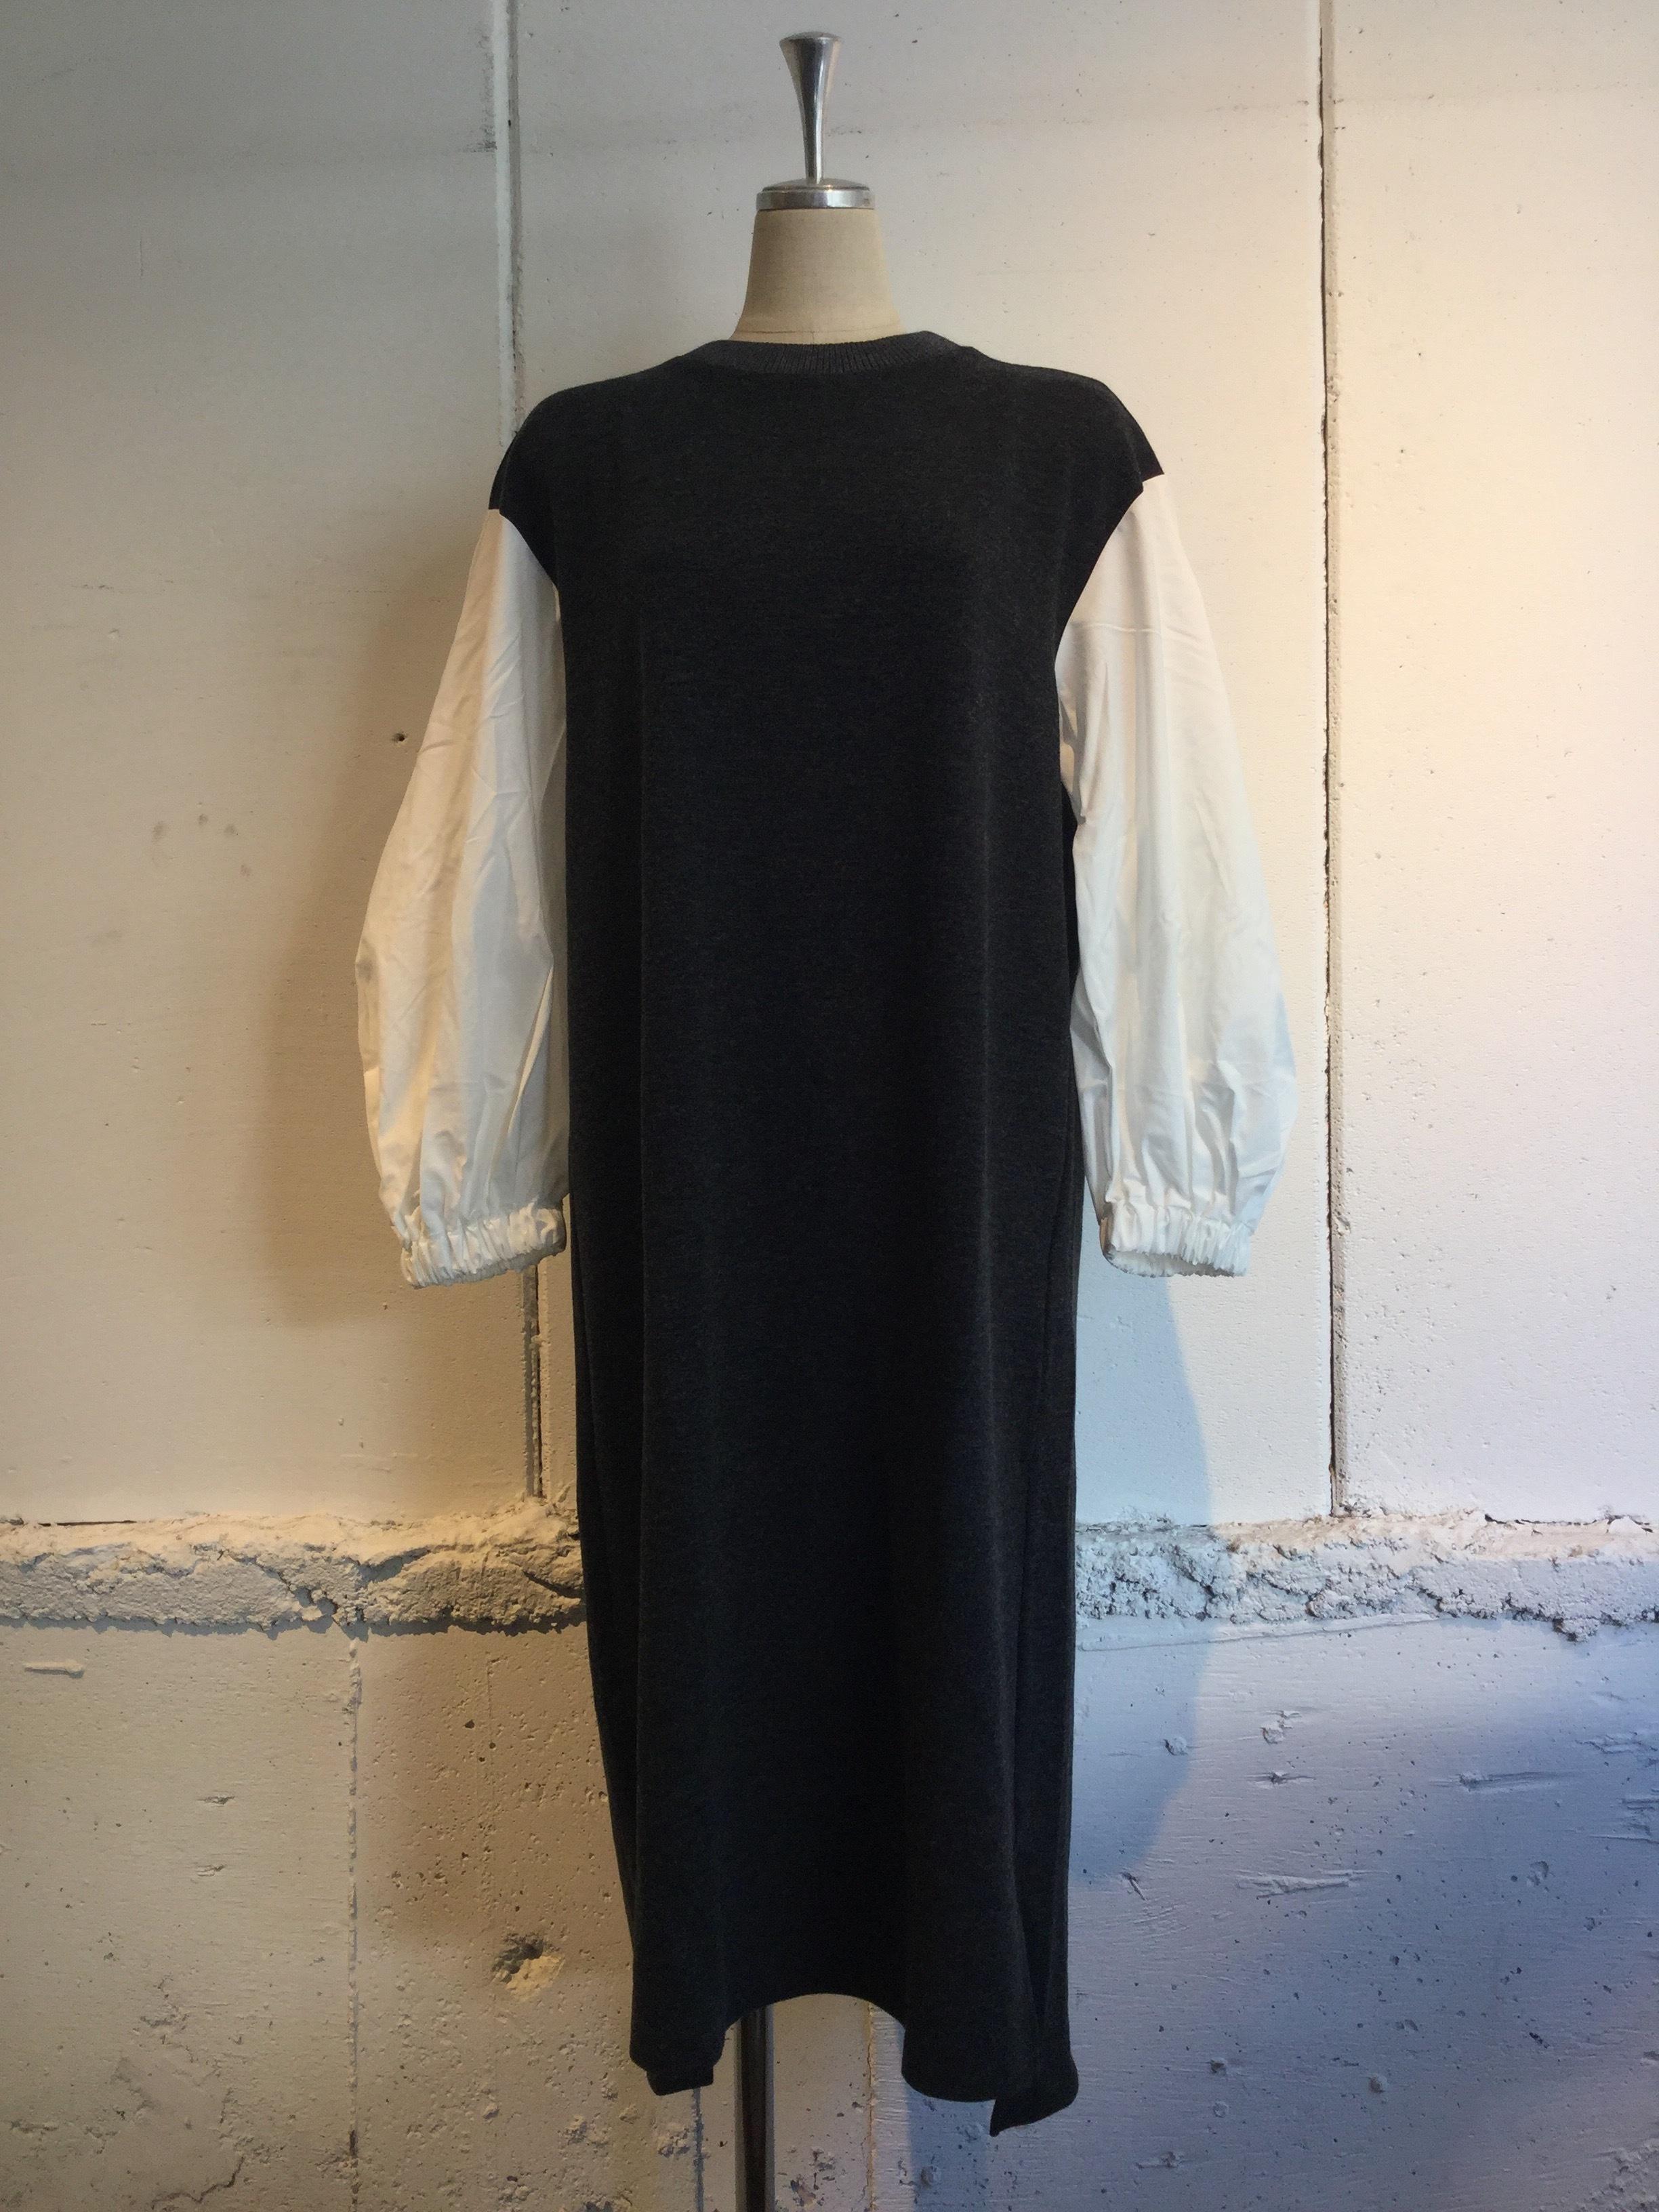 MUVEIL WORK 布帛袖ワンピース (charcoal)